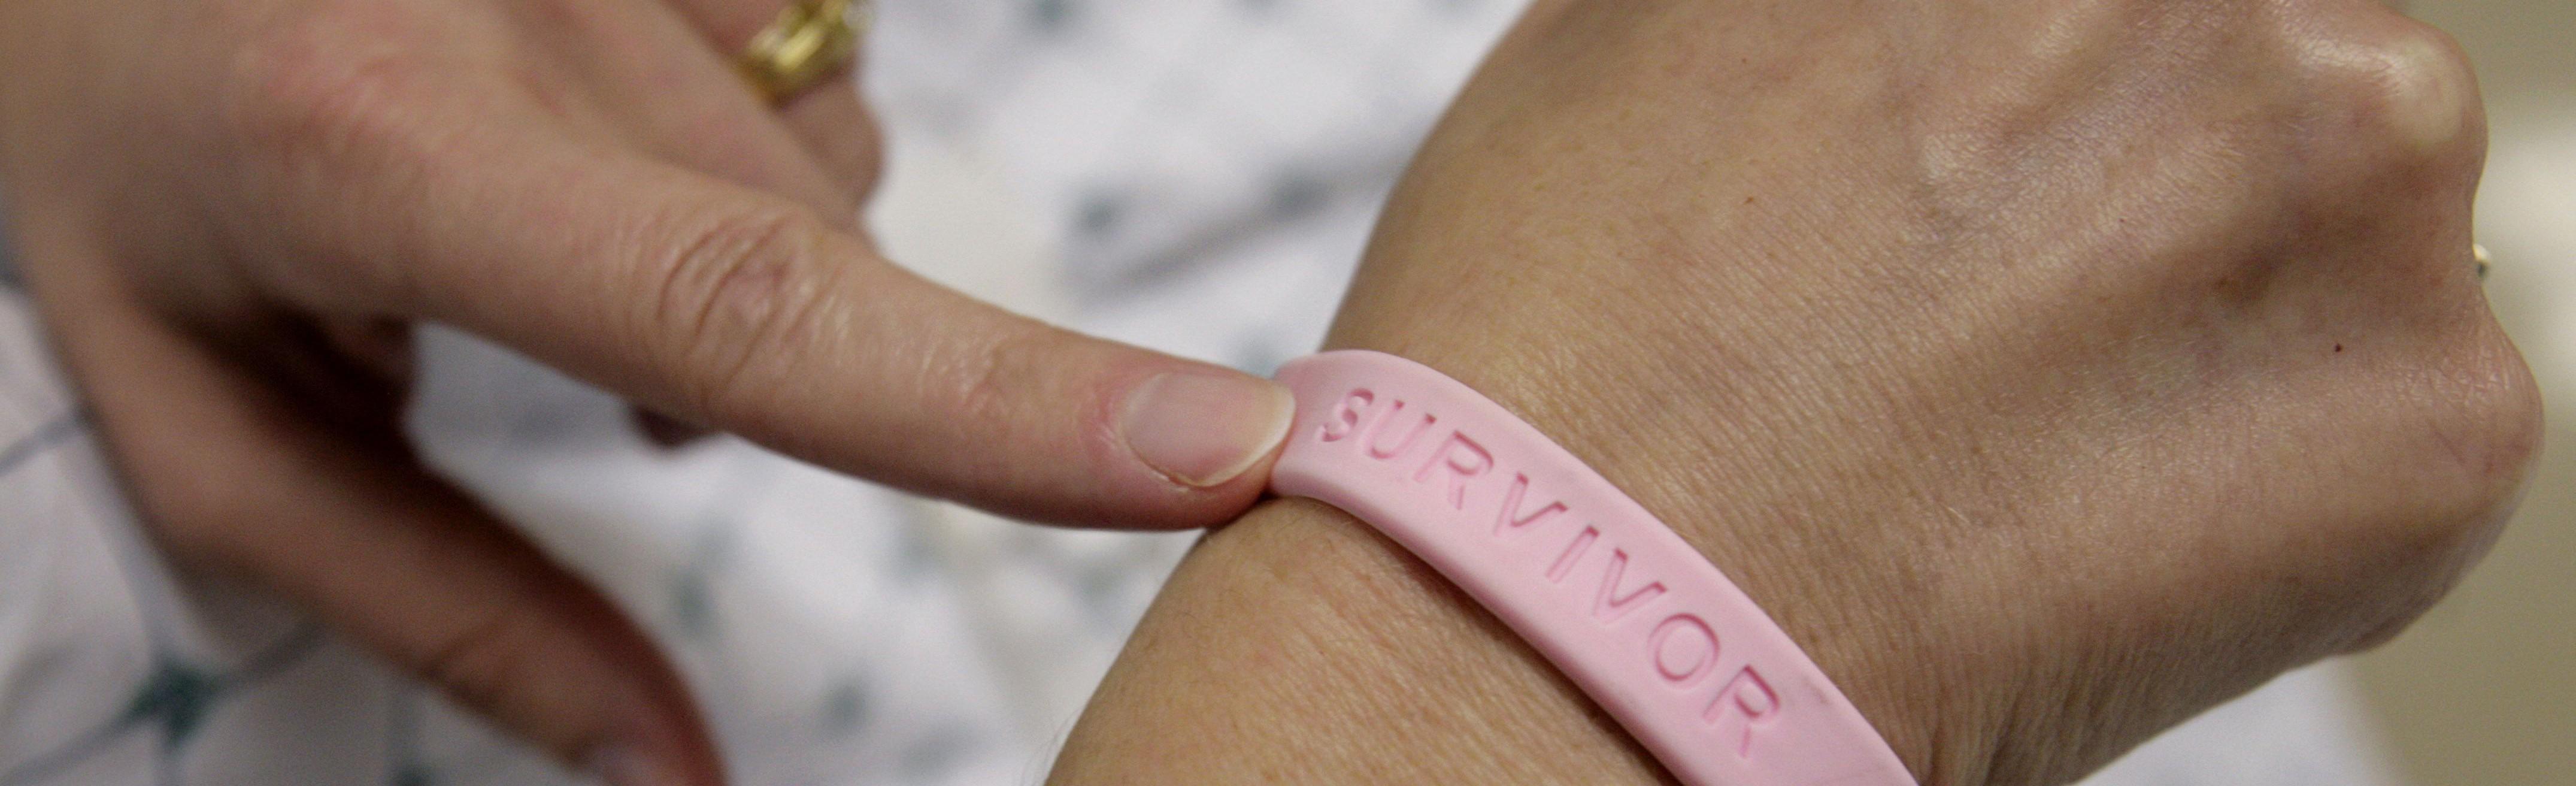 cancer_survivor_wristband